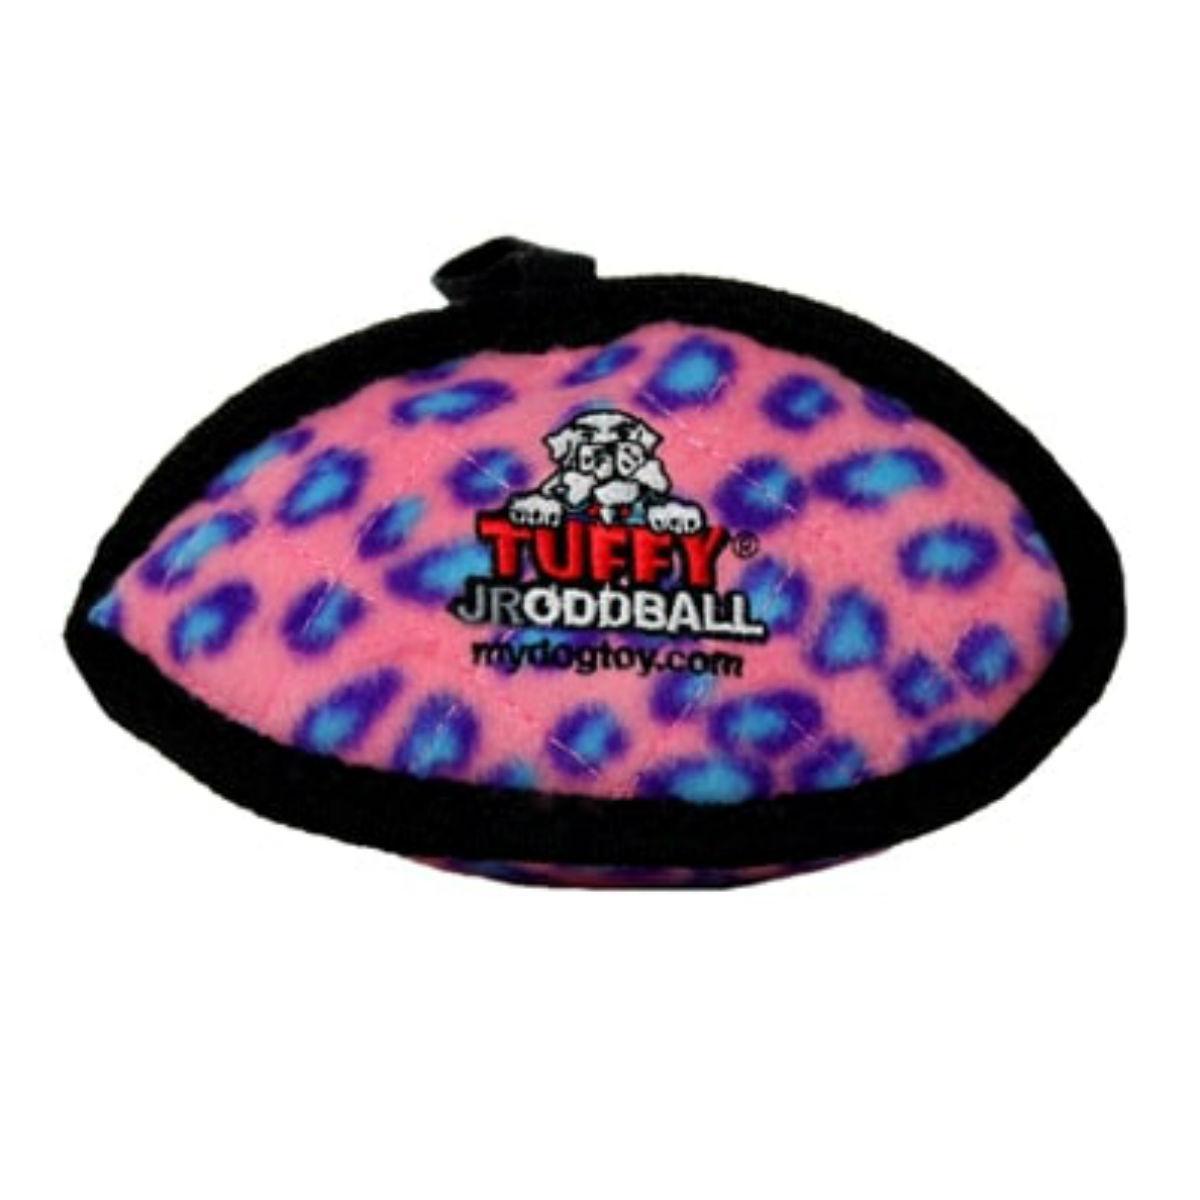 Tuffy Jr Oddball Dog Toy - Pink Leopard